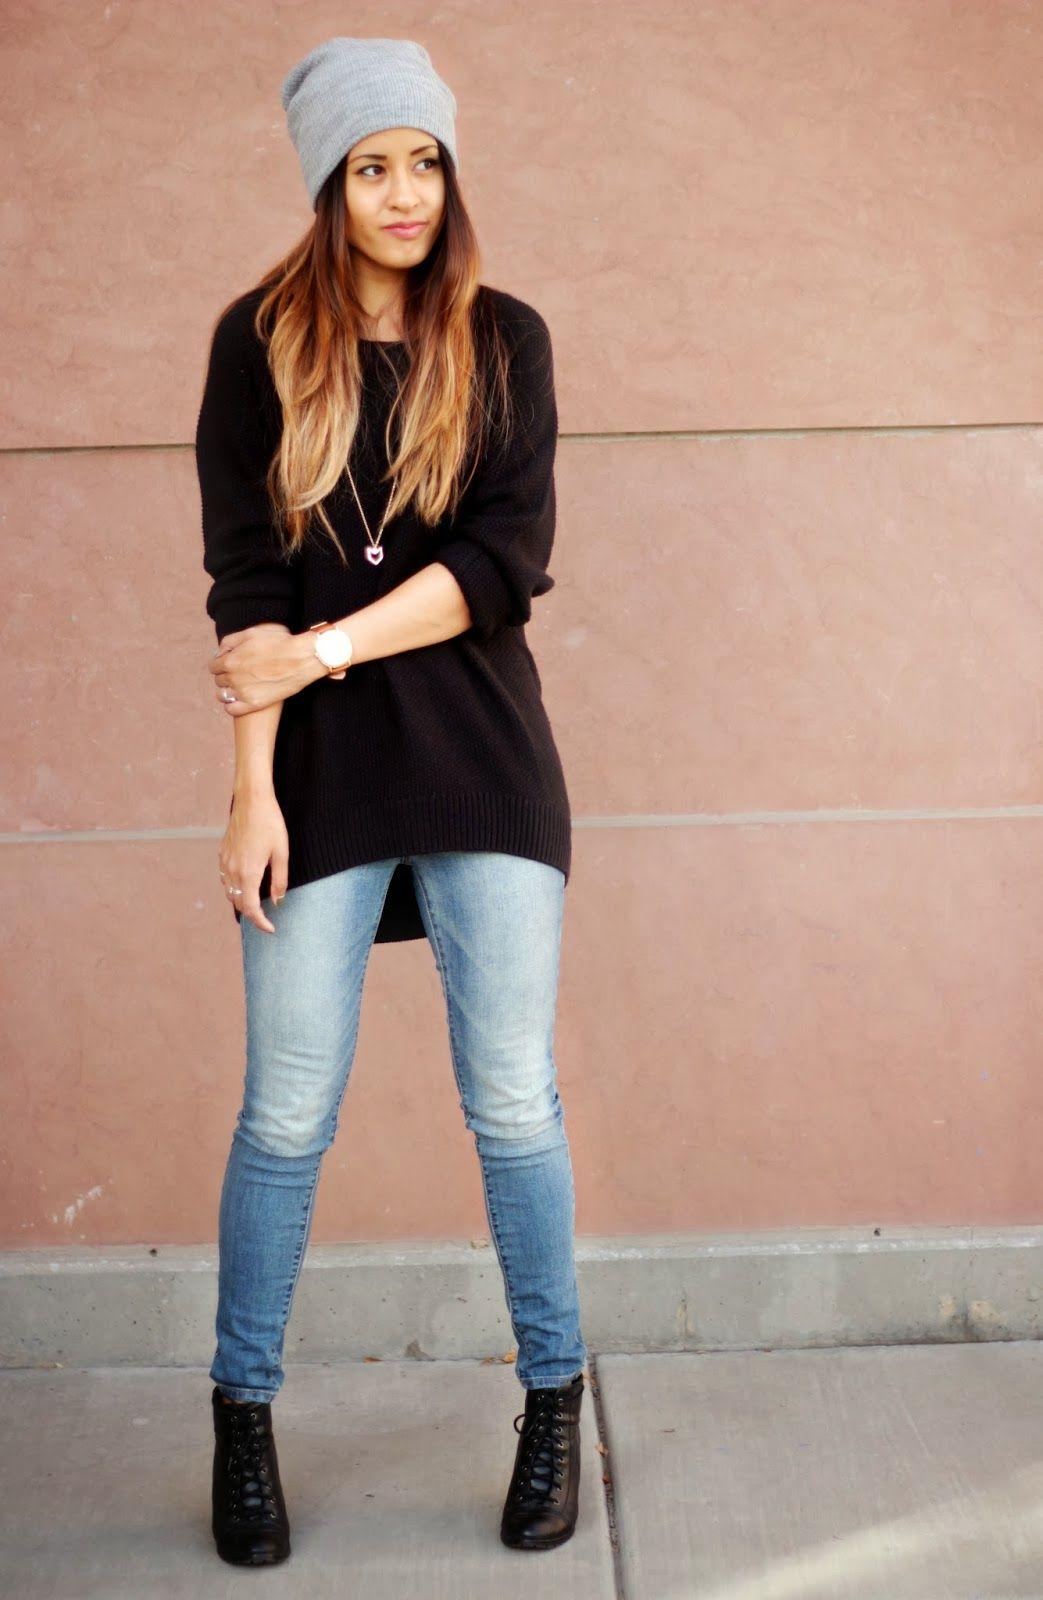 b5b0b32ea8a Fall Outfit | auteur ariel [ blog + youtube ] | Winter fashion ...